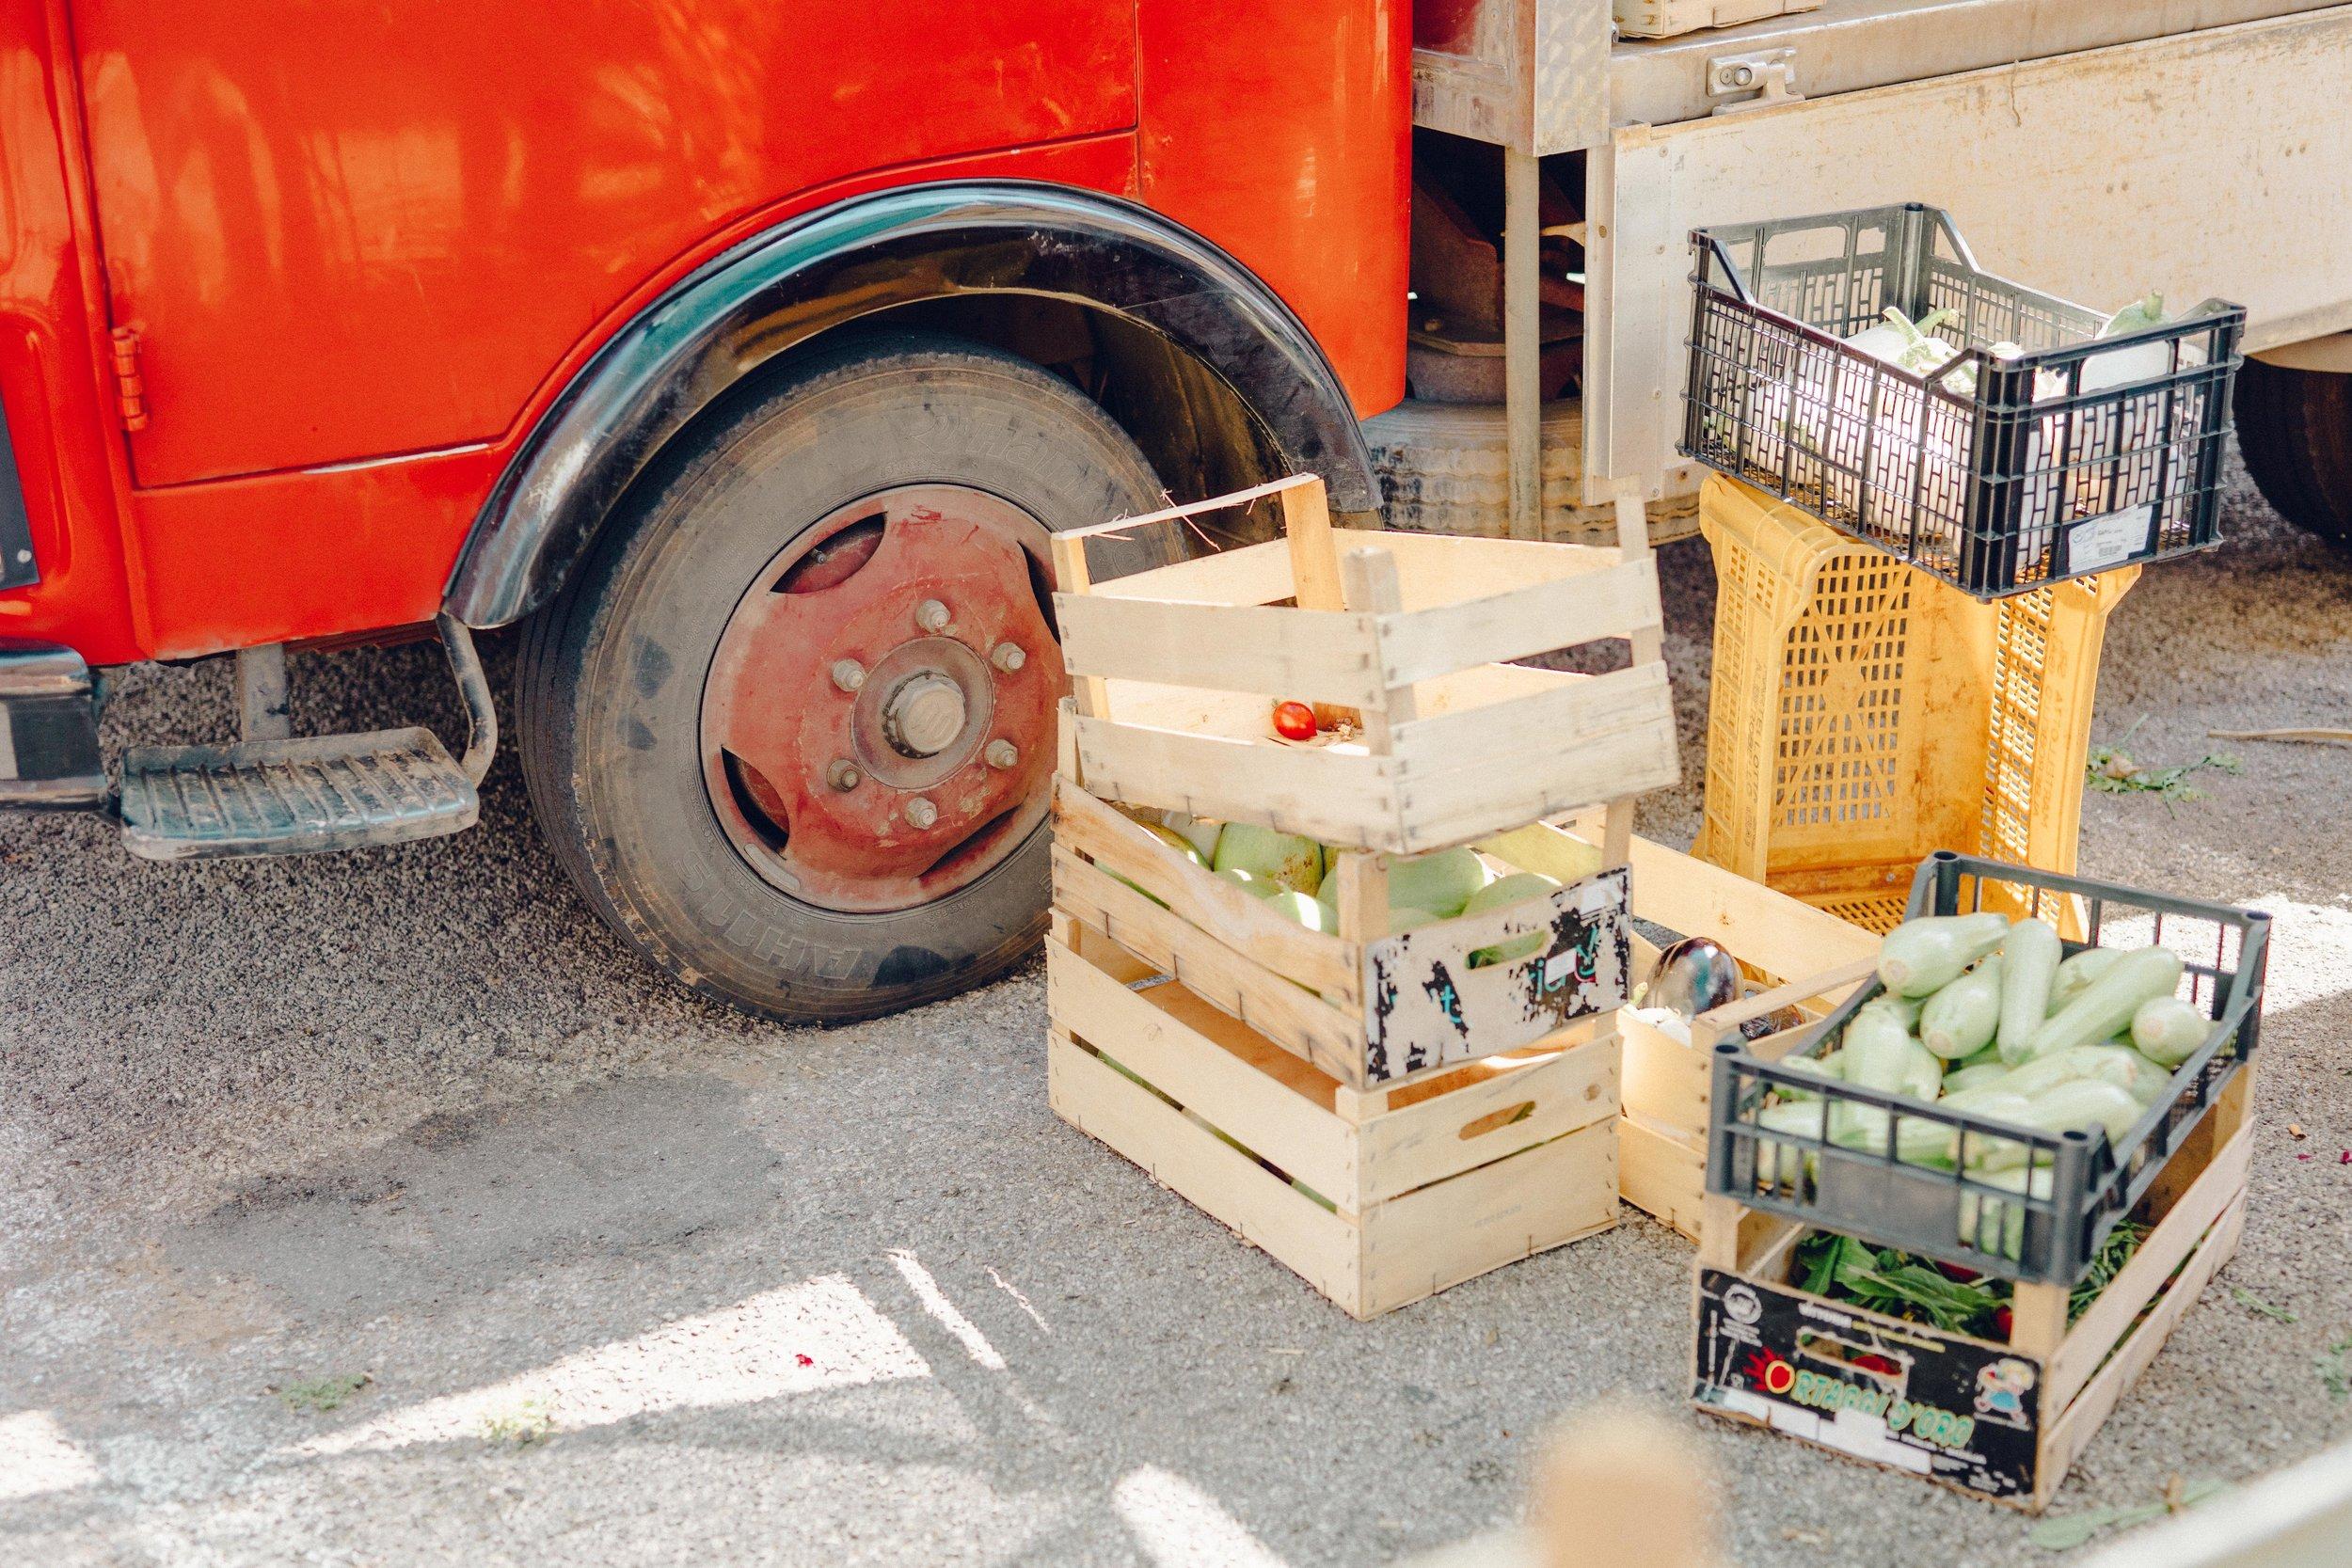 ASROSENVINGE_Italy_Roadtrip_Puglia_Martinafranca_Market-07209.jpg